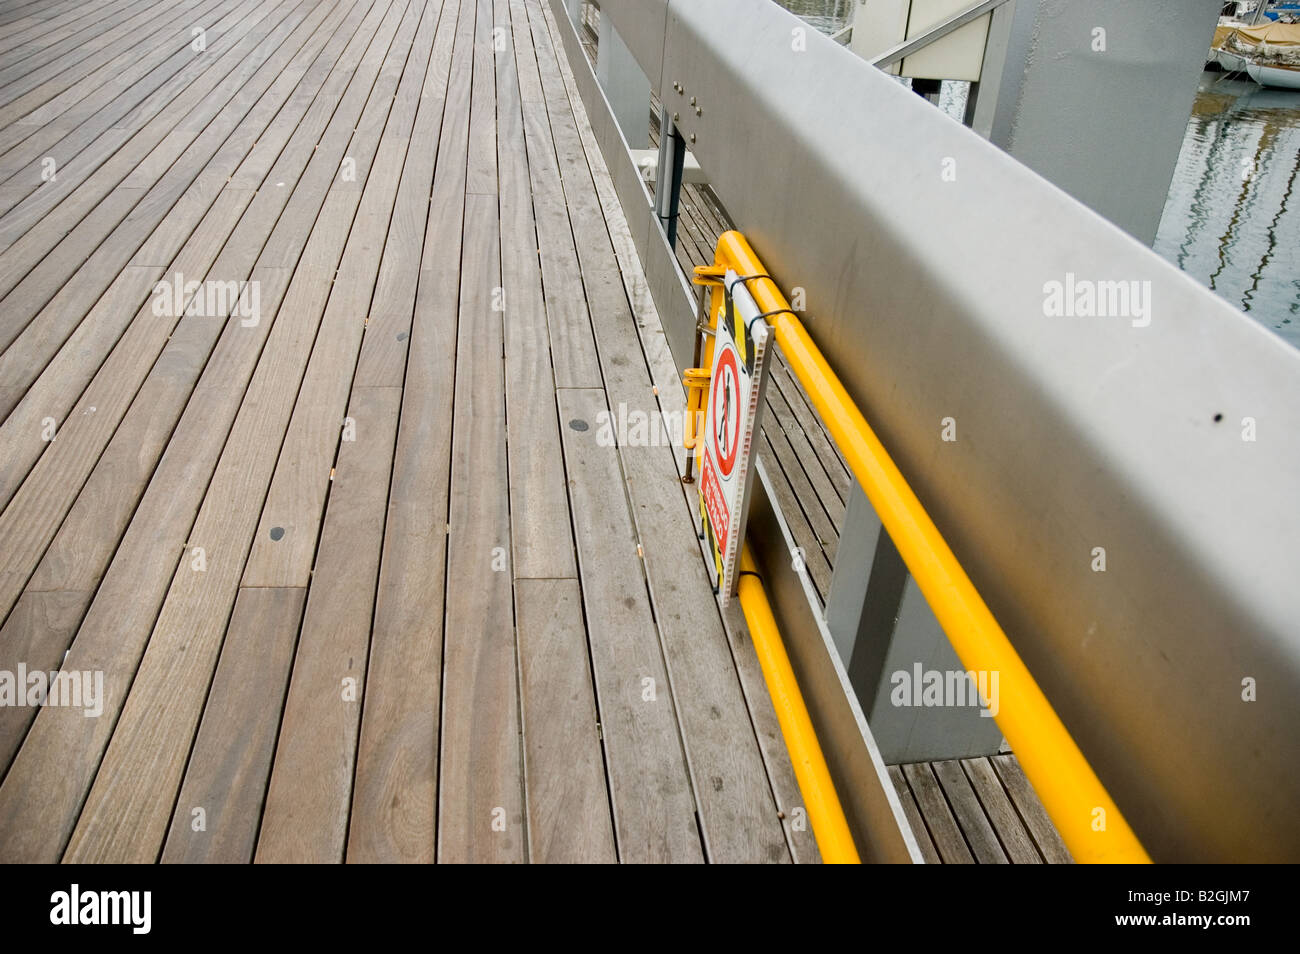 Rambla de Mar Port Vell bridge access deny sign Barcelona Spain Stock Photo